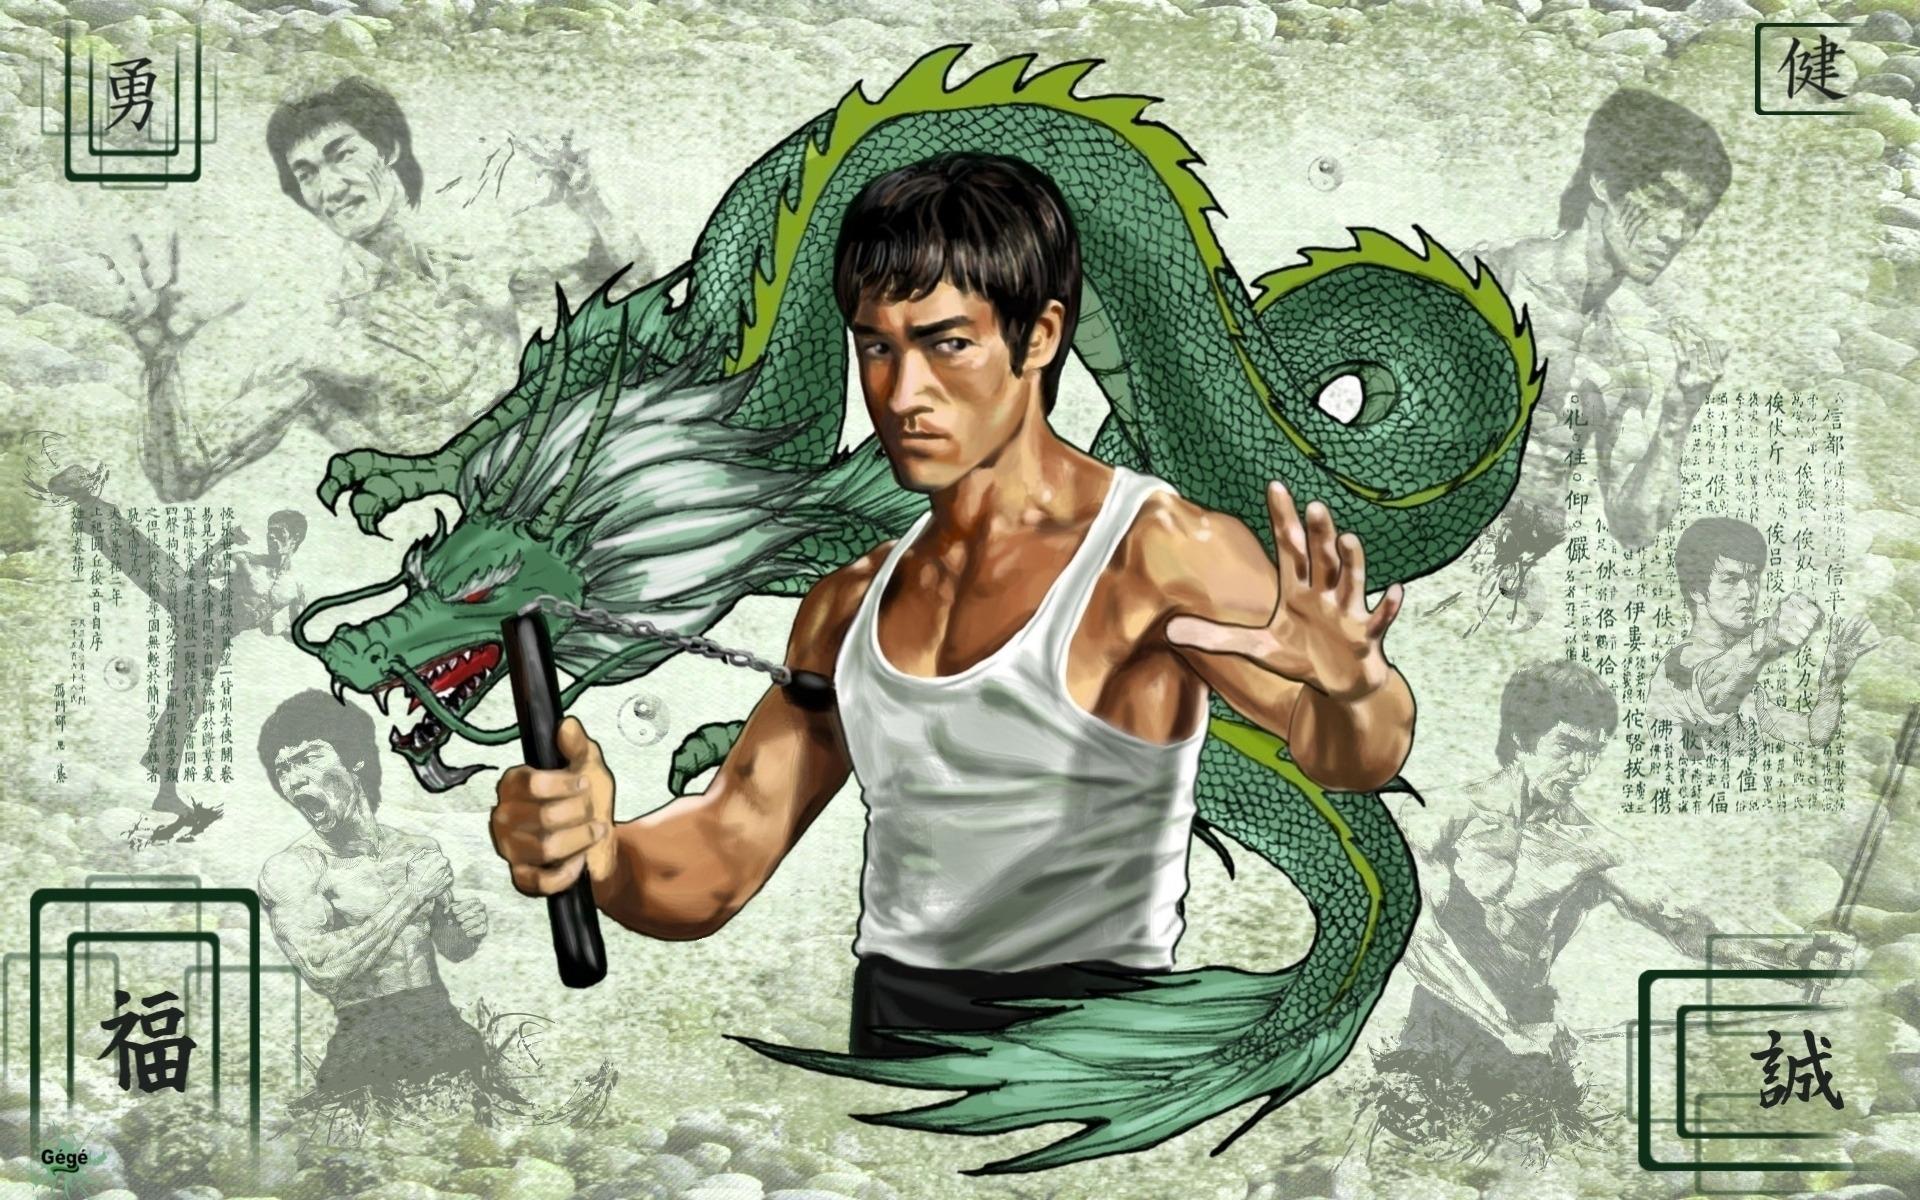 lee s dragon